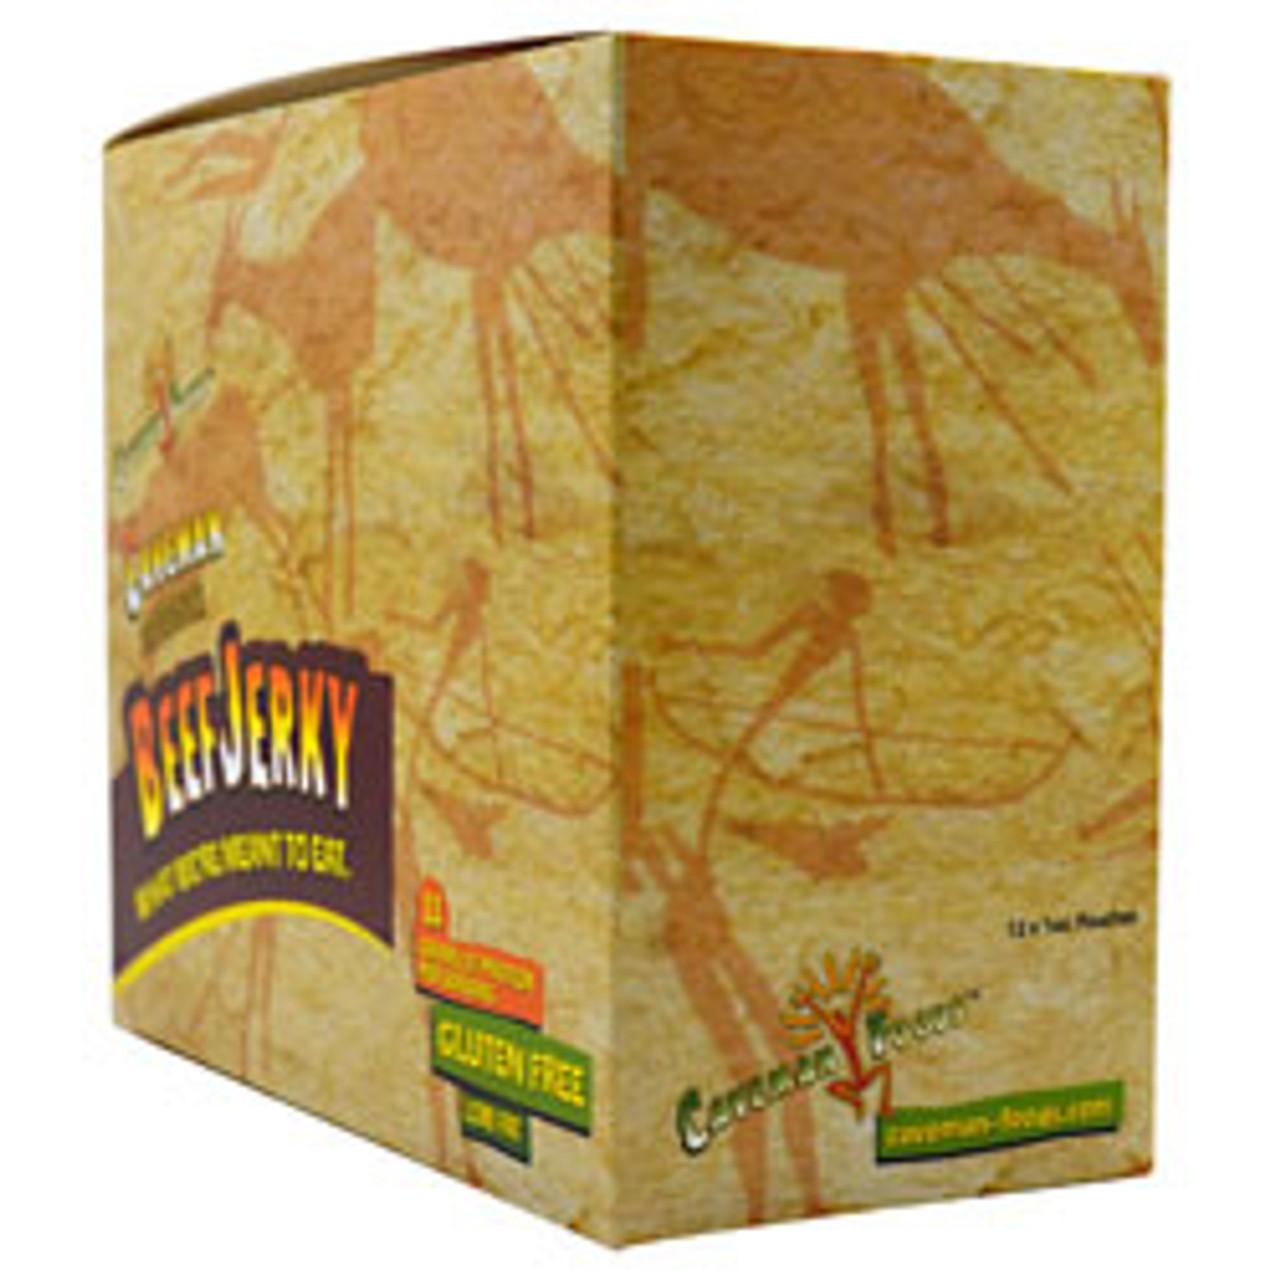 Caveman Beef Jerky 12pk Caveman Foods